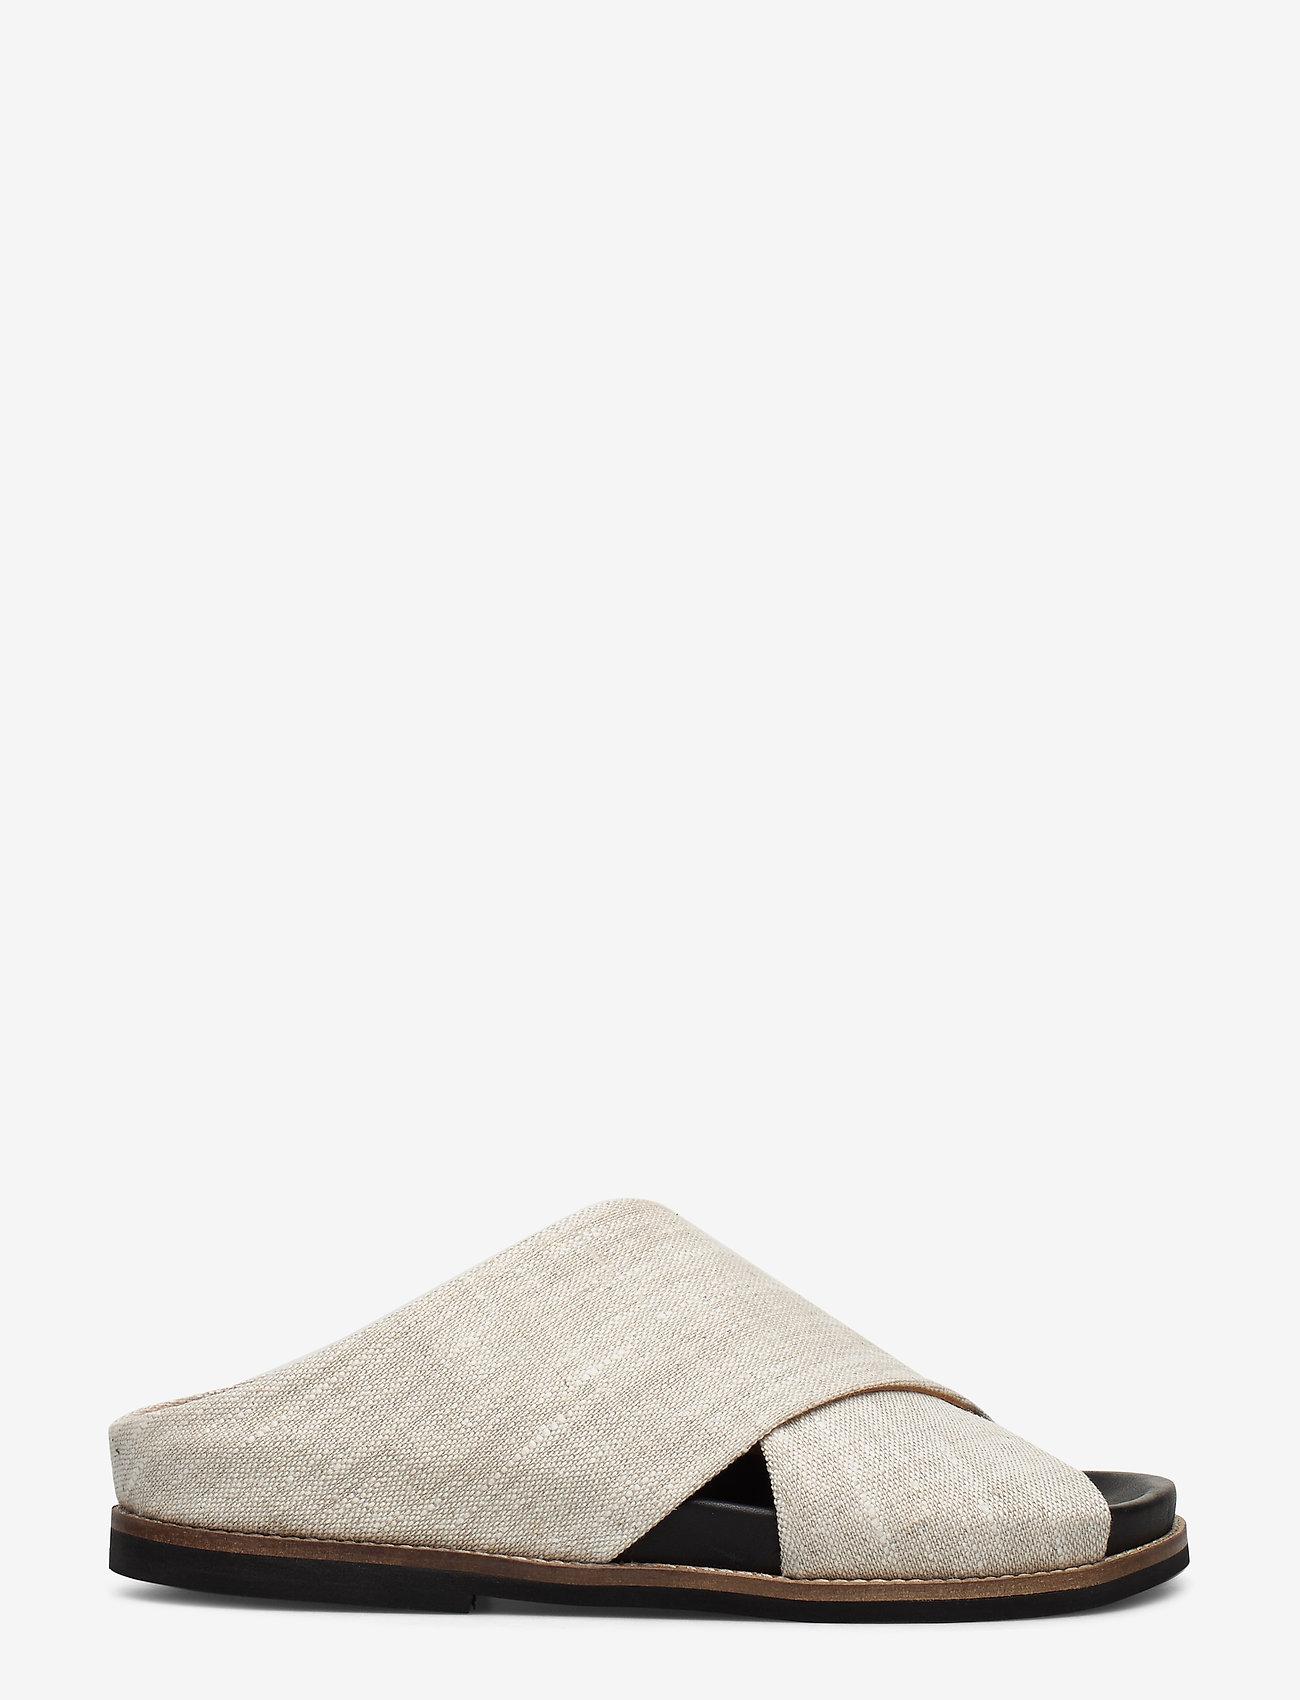 Ganni - Flat Sandals - płaskie sandały - nature - 1